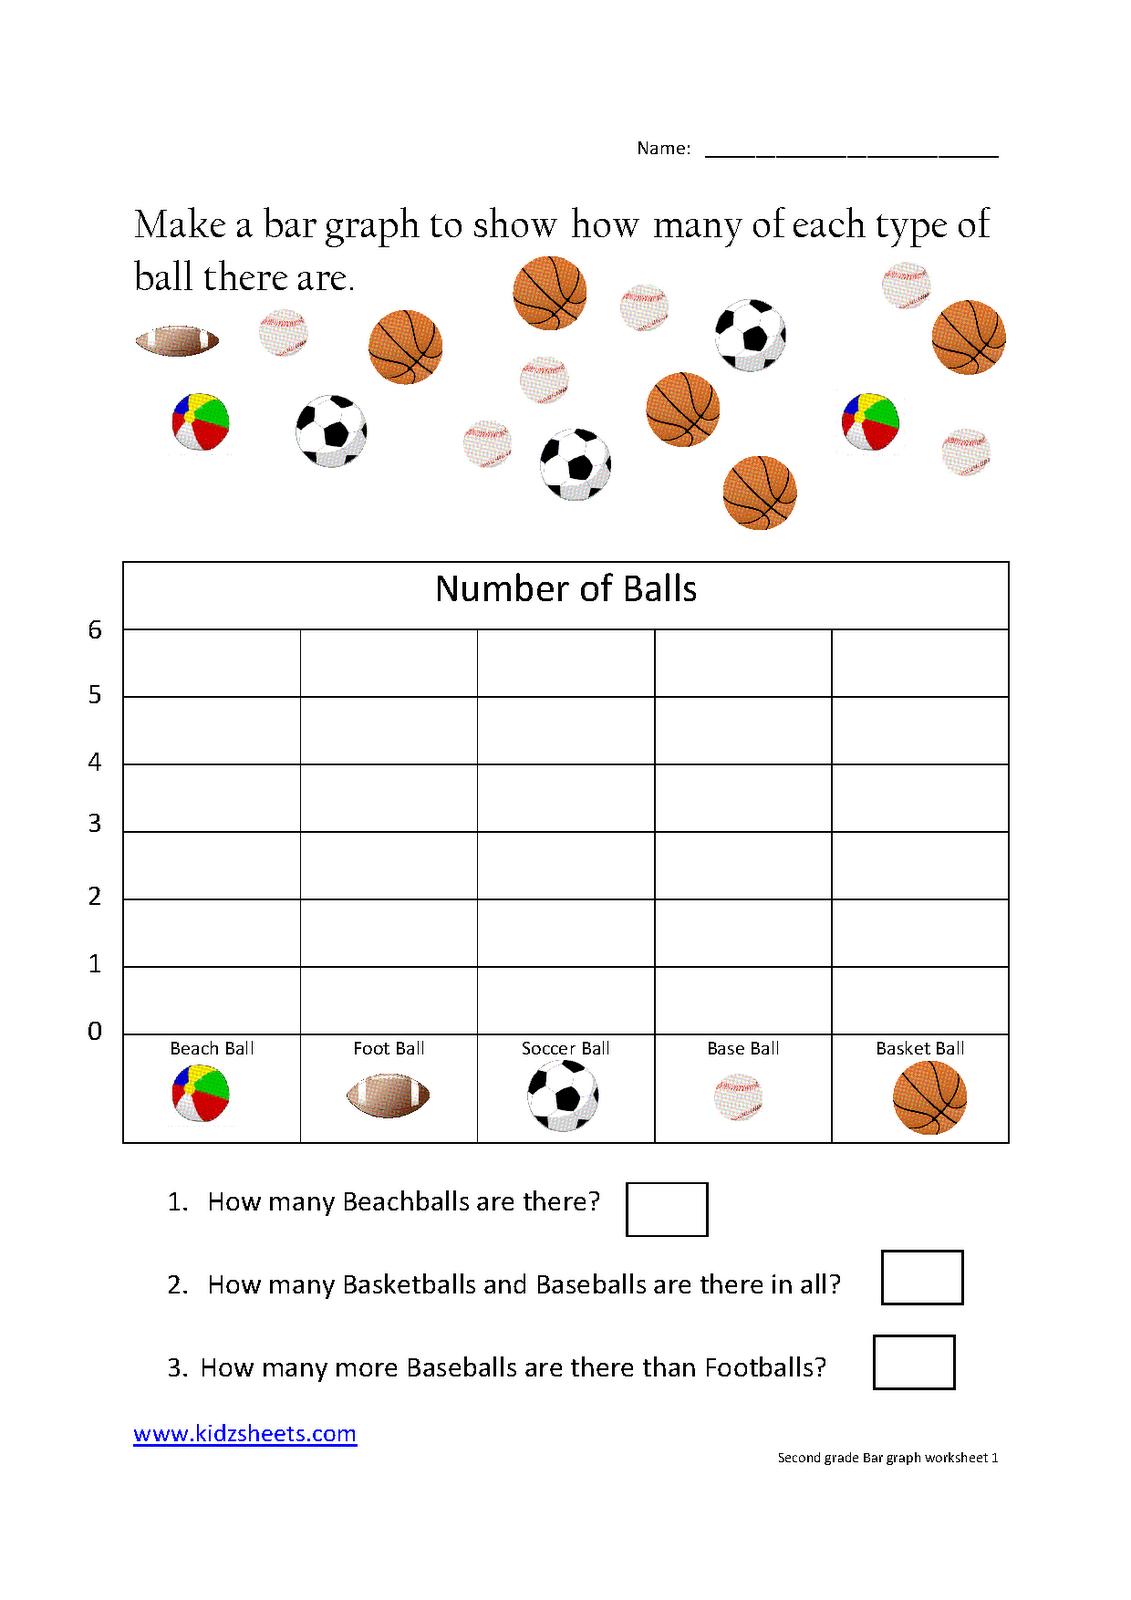 hight resolution of Kidz Worksheets: Second Grade Bar Graph Worksheet1